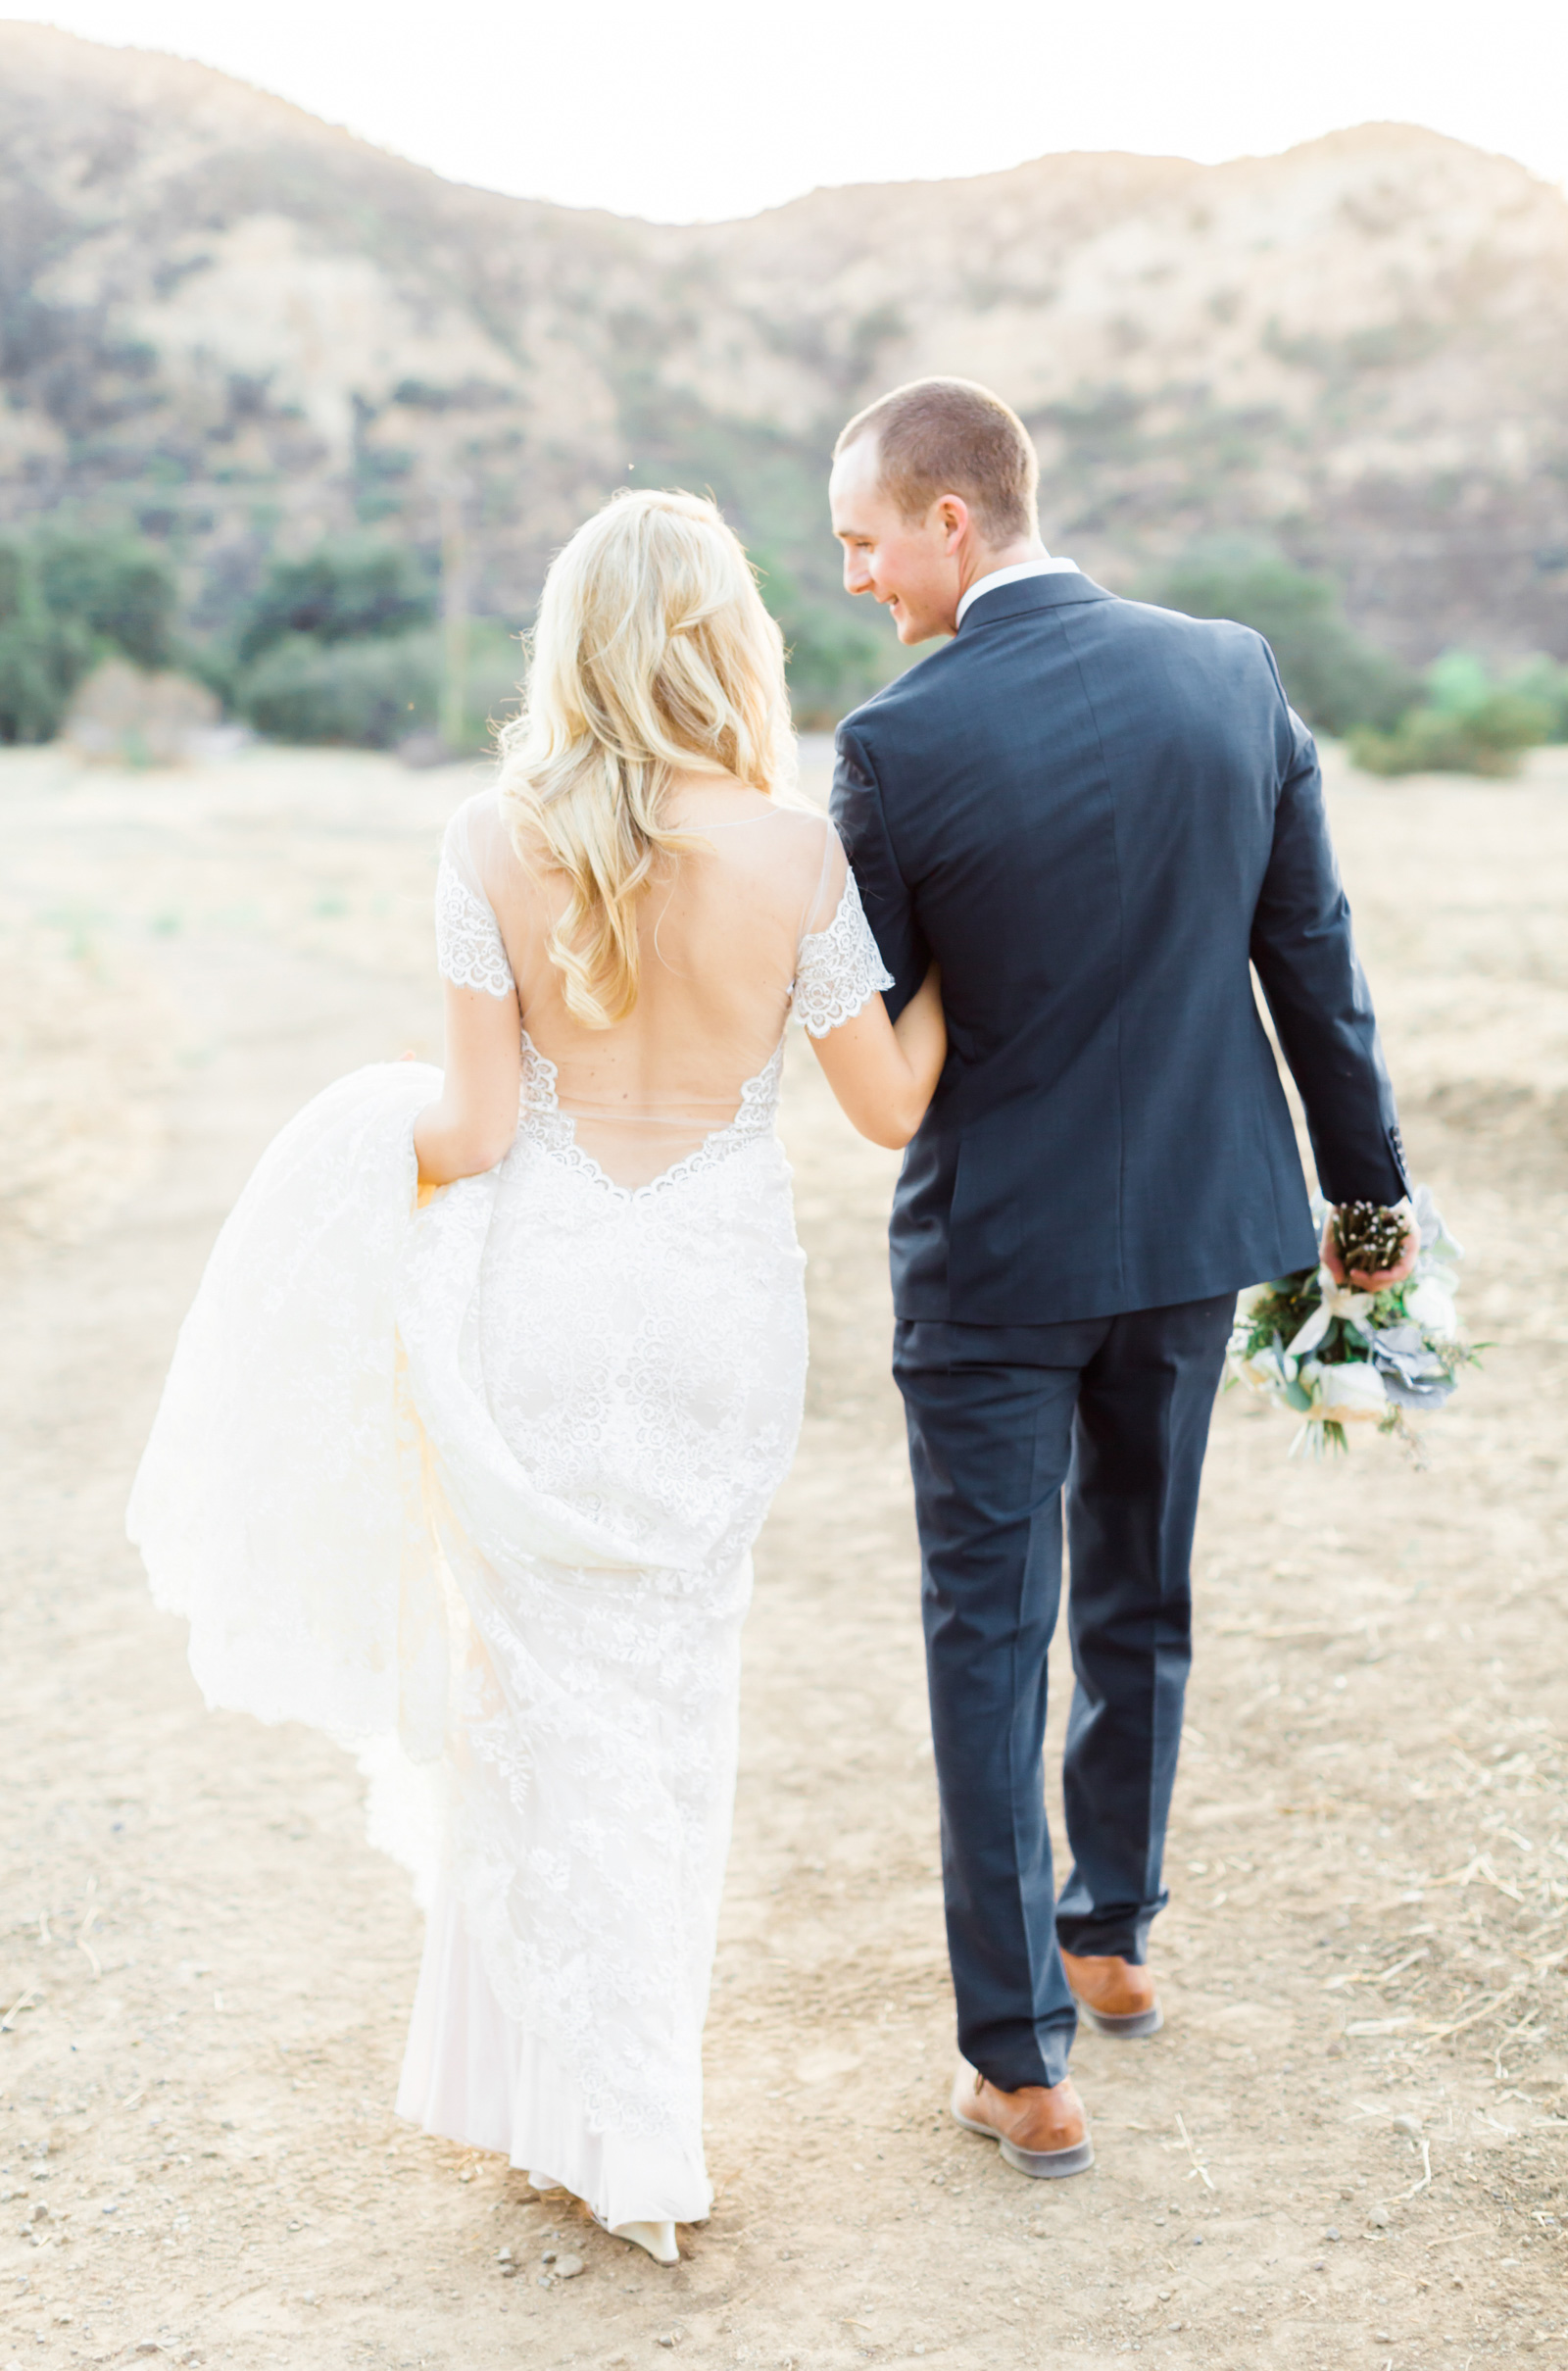 California-Wedding-Photographer-Style-Me-Pretty-Natalie-Schutt-San-Luis-Obispo_08.jpg